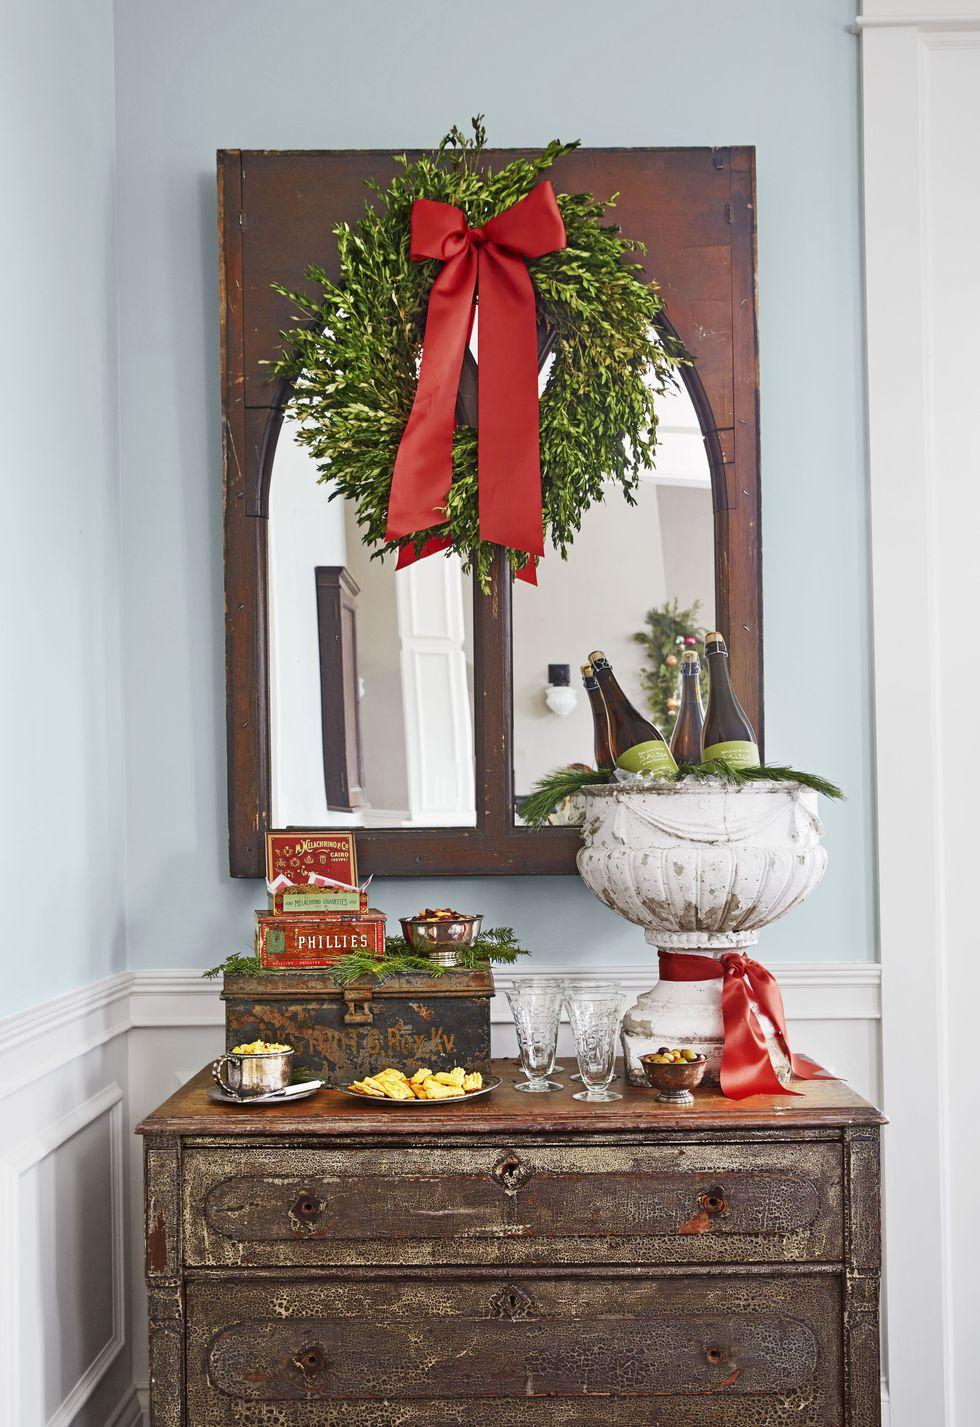 spirit-christmas-past-repurposed-planter-1216.jpg